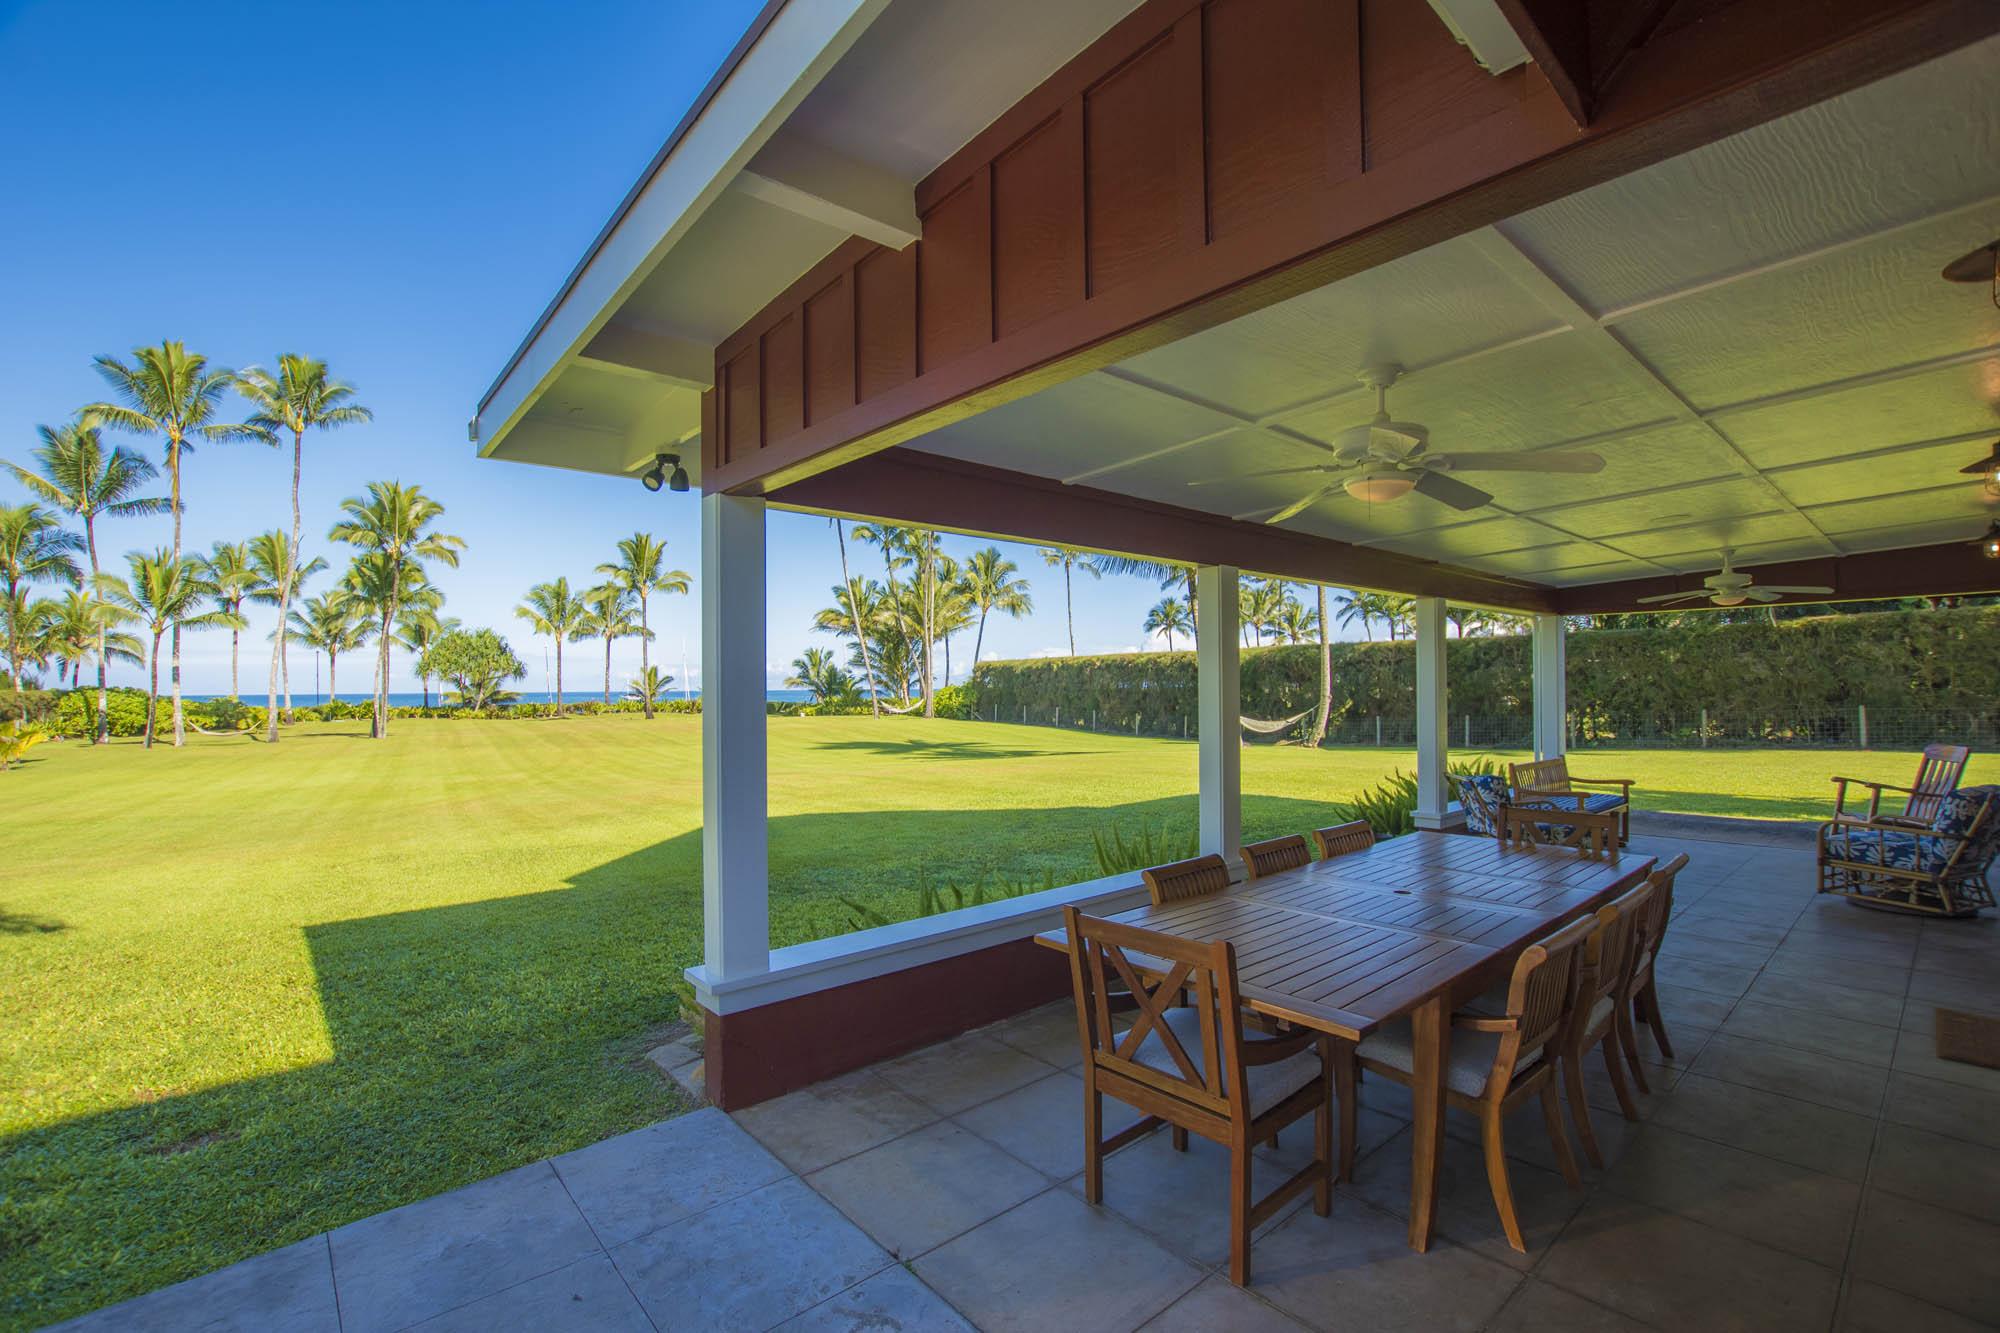 Kauai-217-Hanalei Bay33